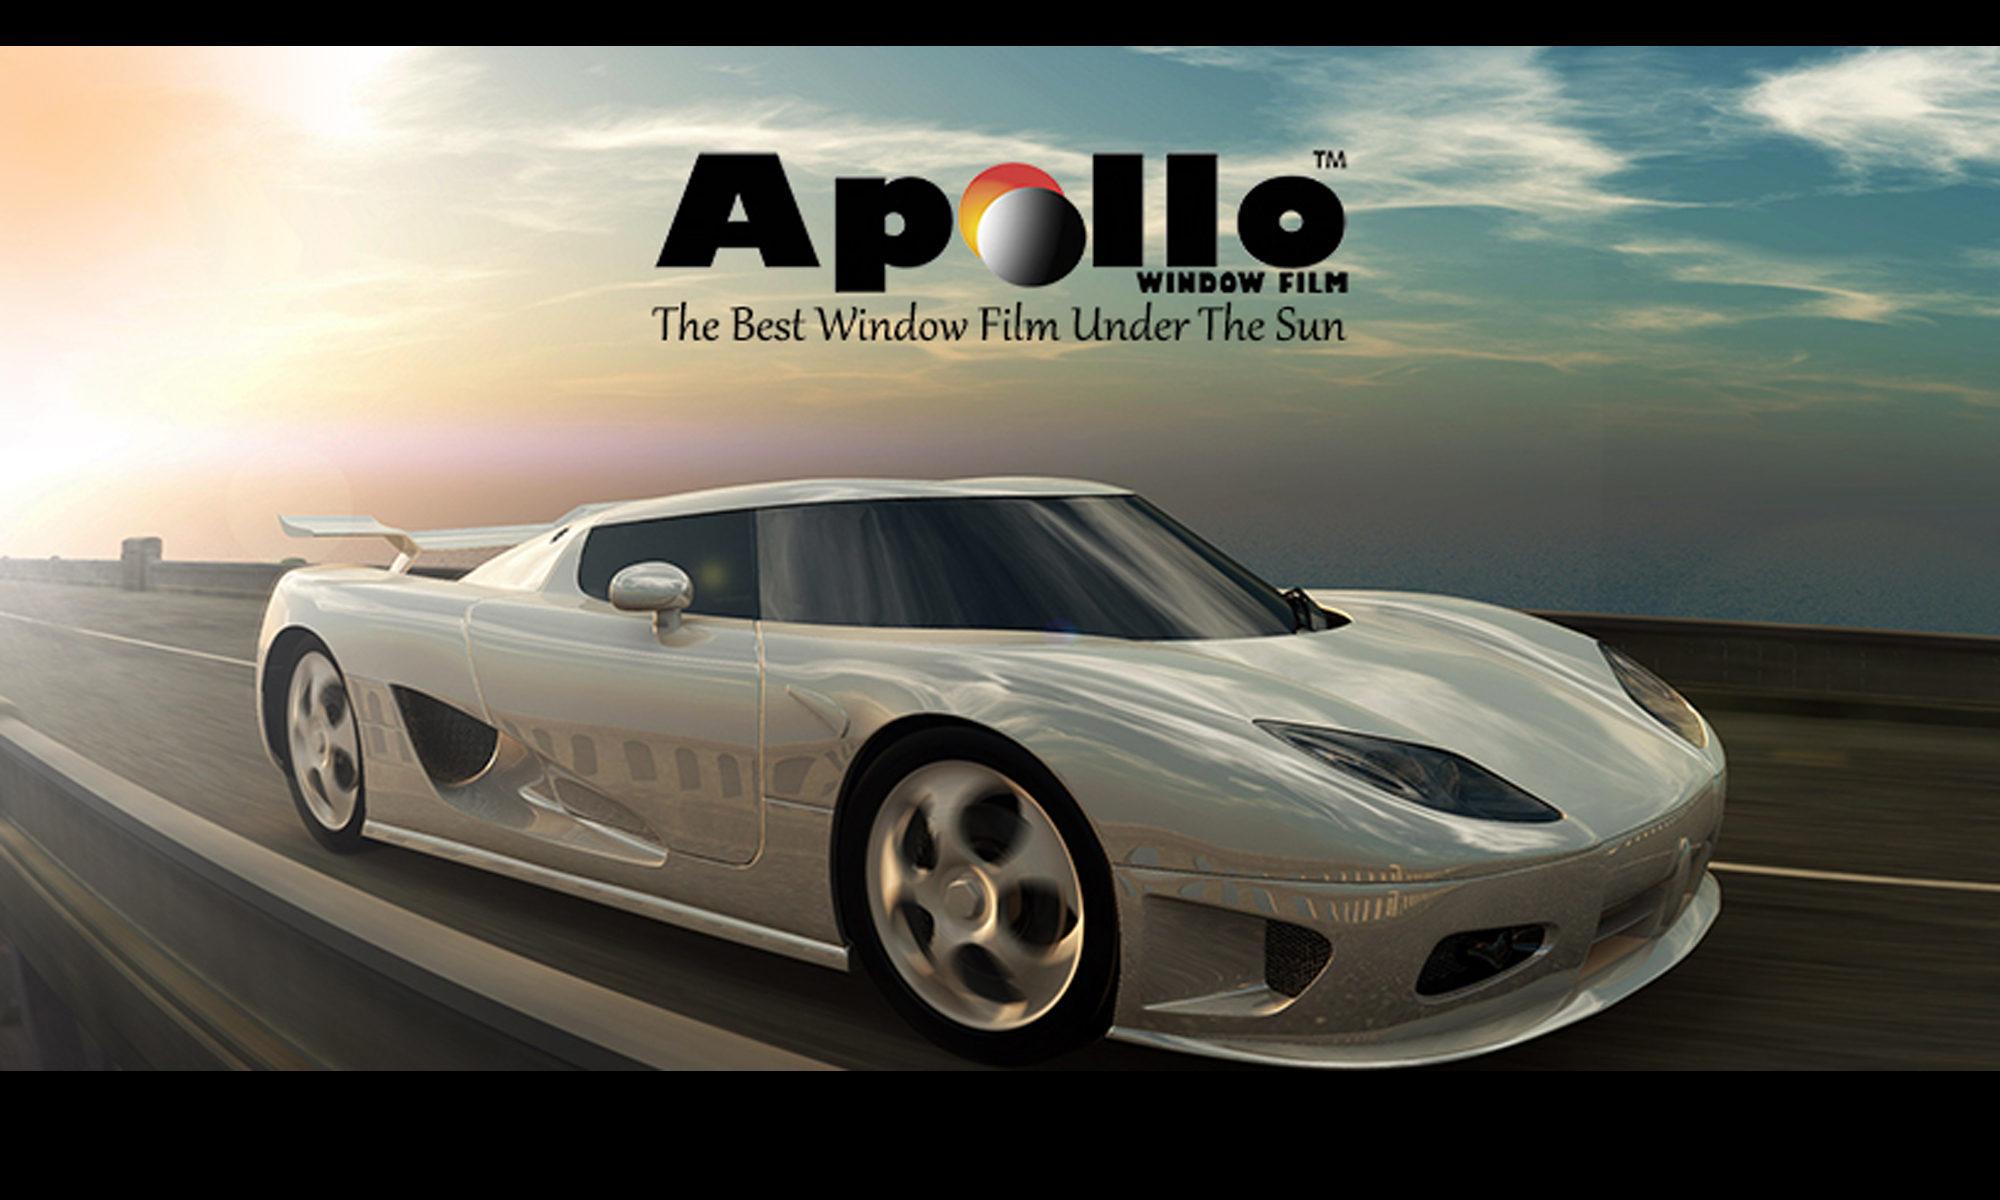 Apollo Window Film